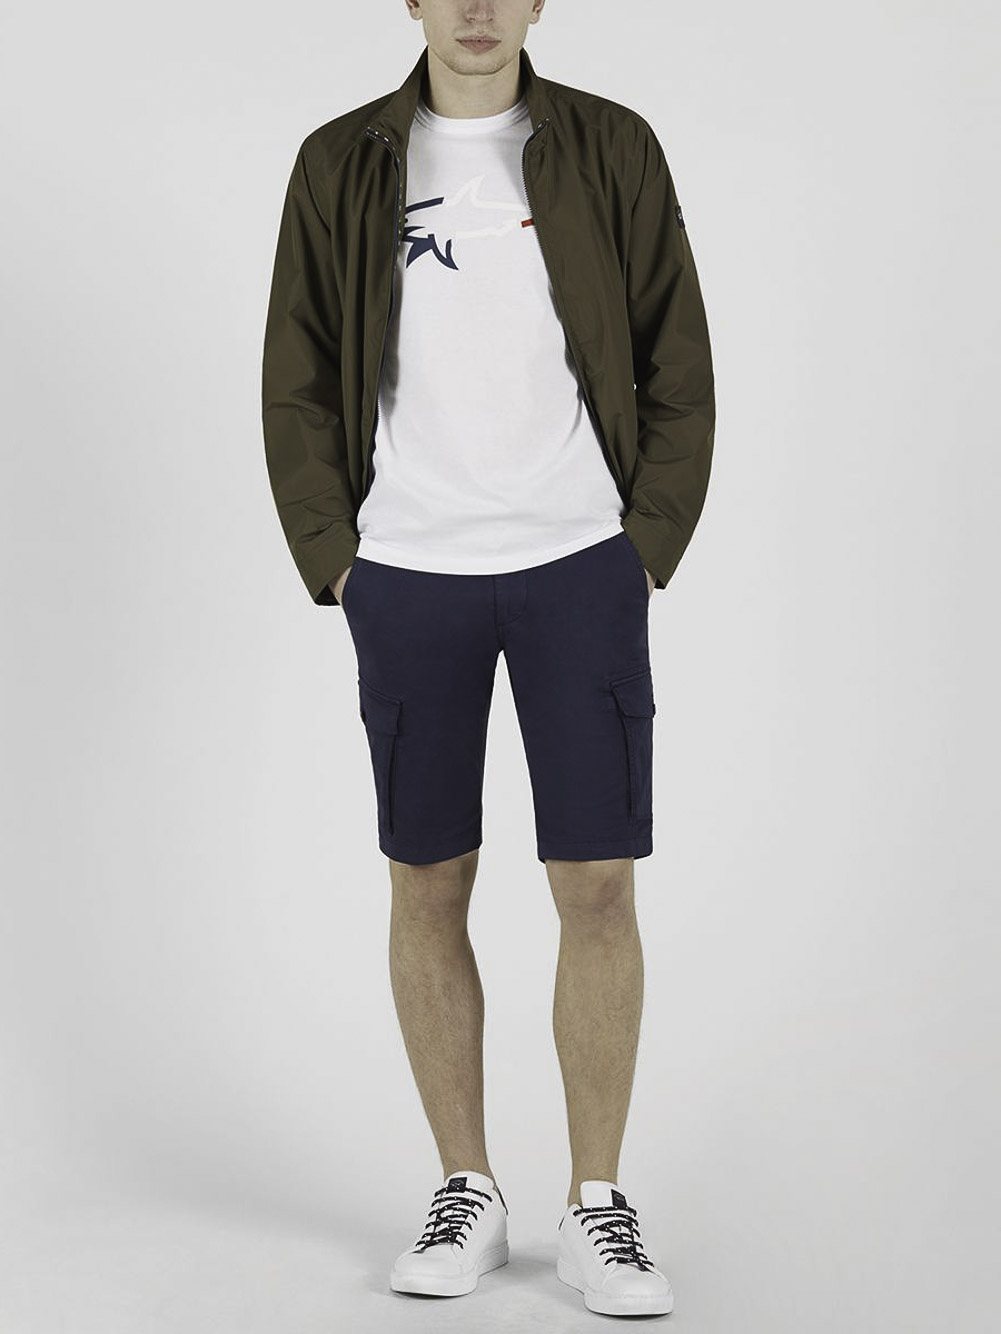 PAUL & SHARK Μπλούζα T-Shirt 21411040-010 ΛΕΥΚΟ